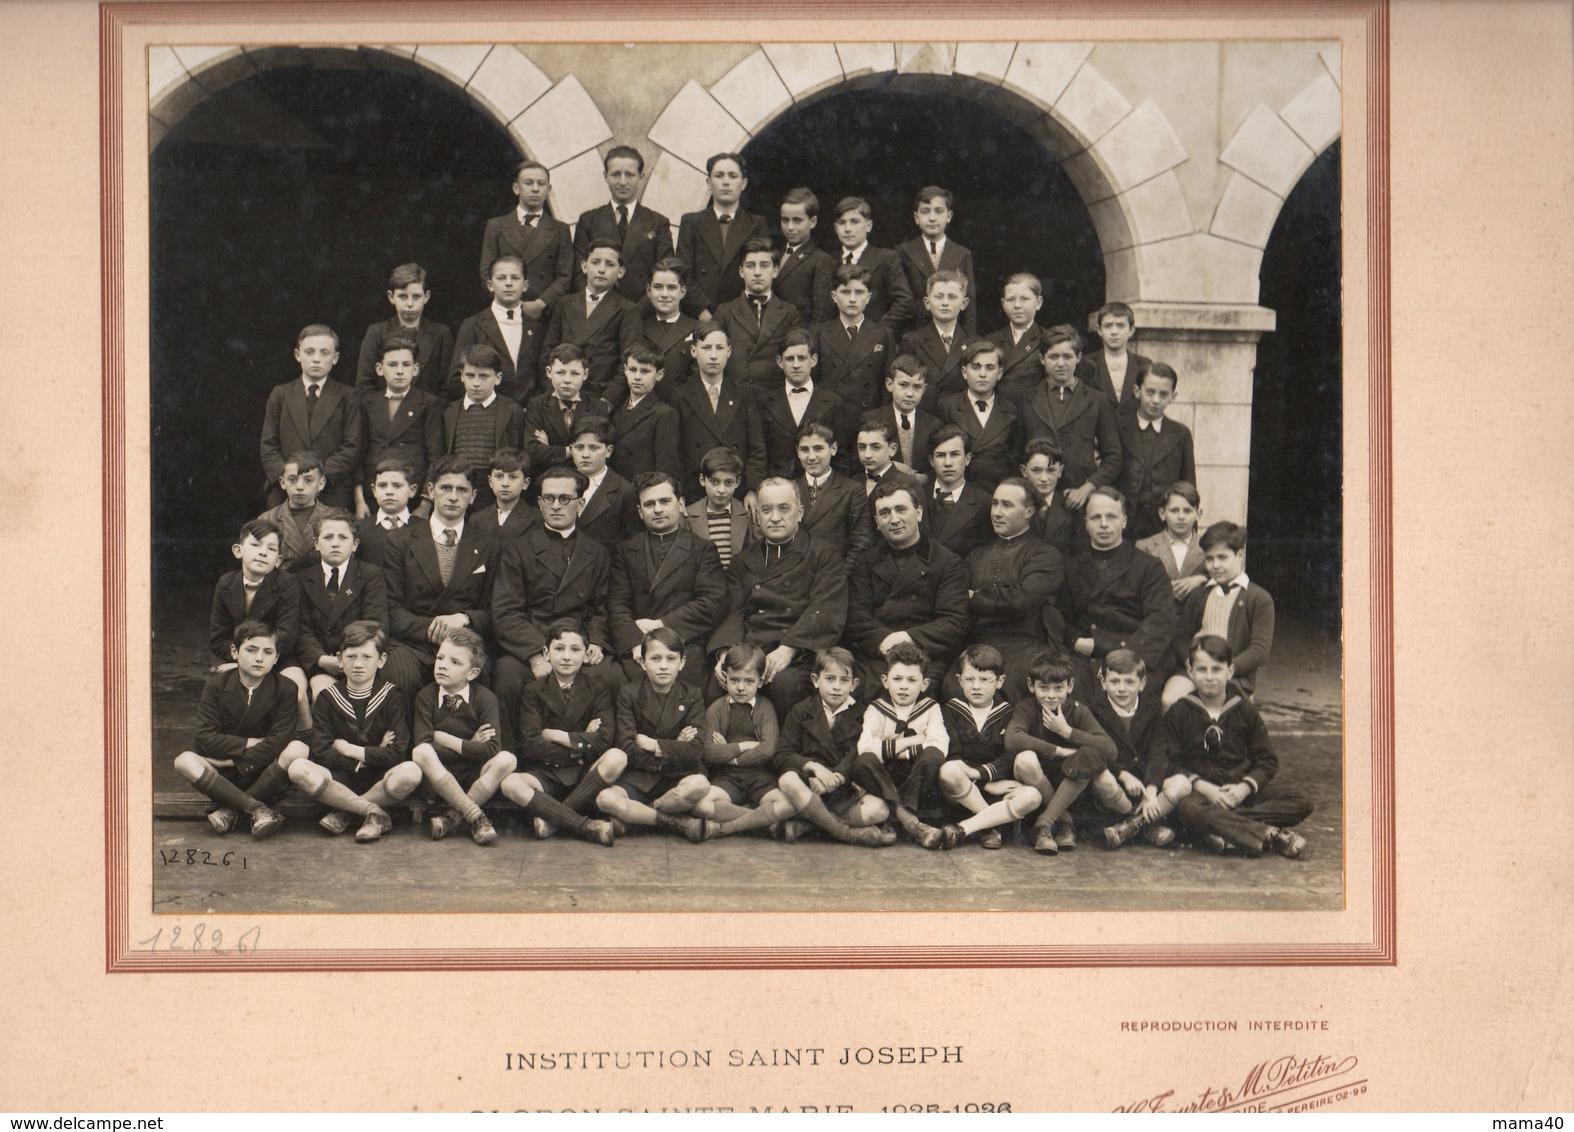 GRANDE PHOTO SUR CARTON - 64 - OLORON STE MARIE - PHOTO DE CLASSE  1935-1936 INSTITUTION SAINT JOSEPH - Anonieme Personen